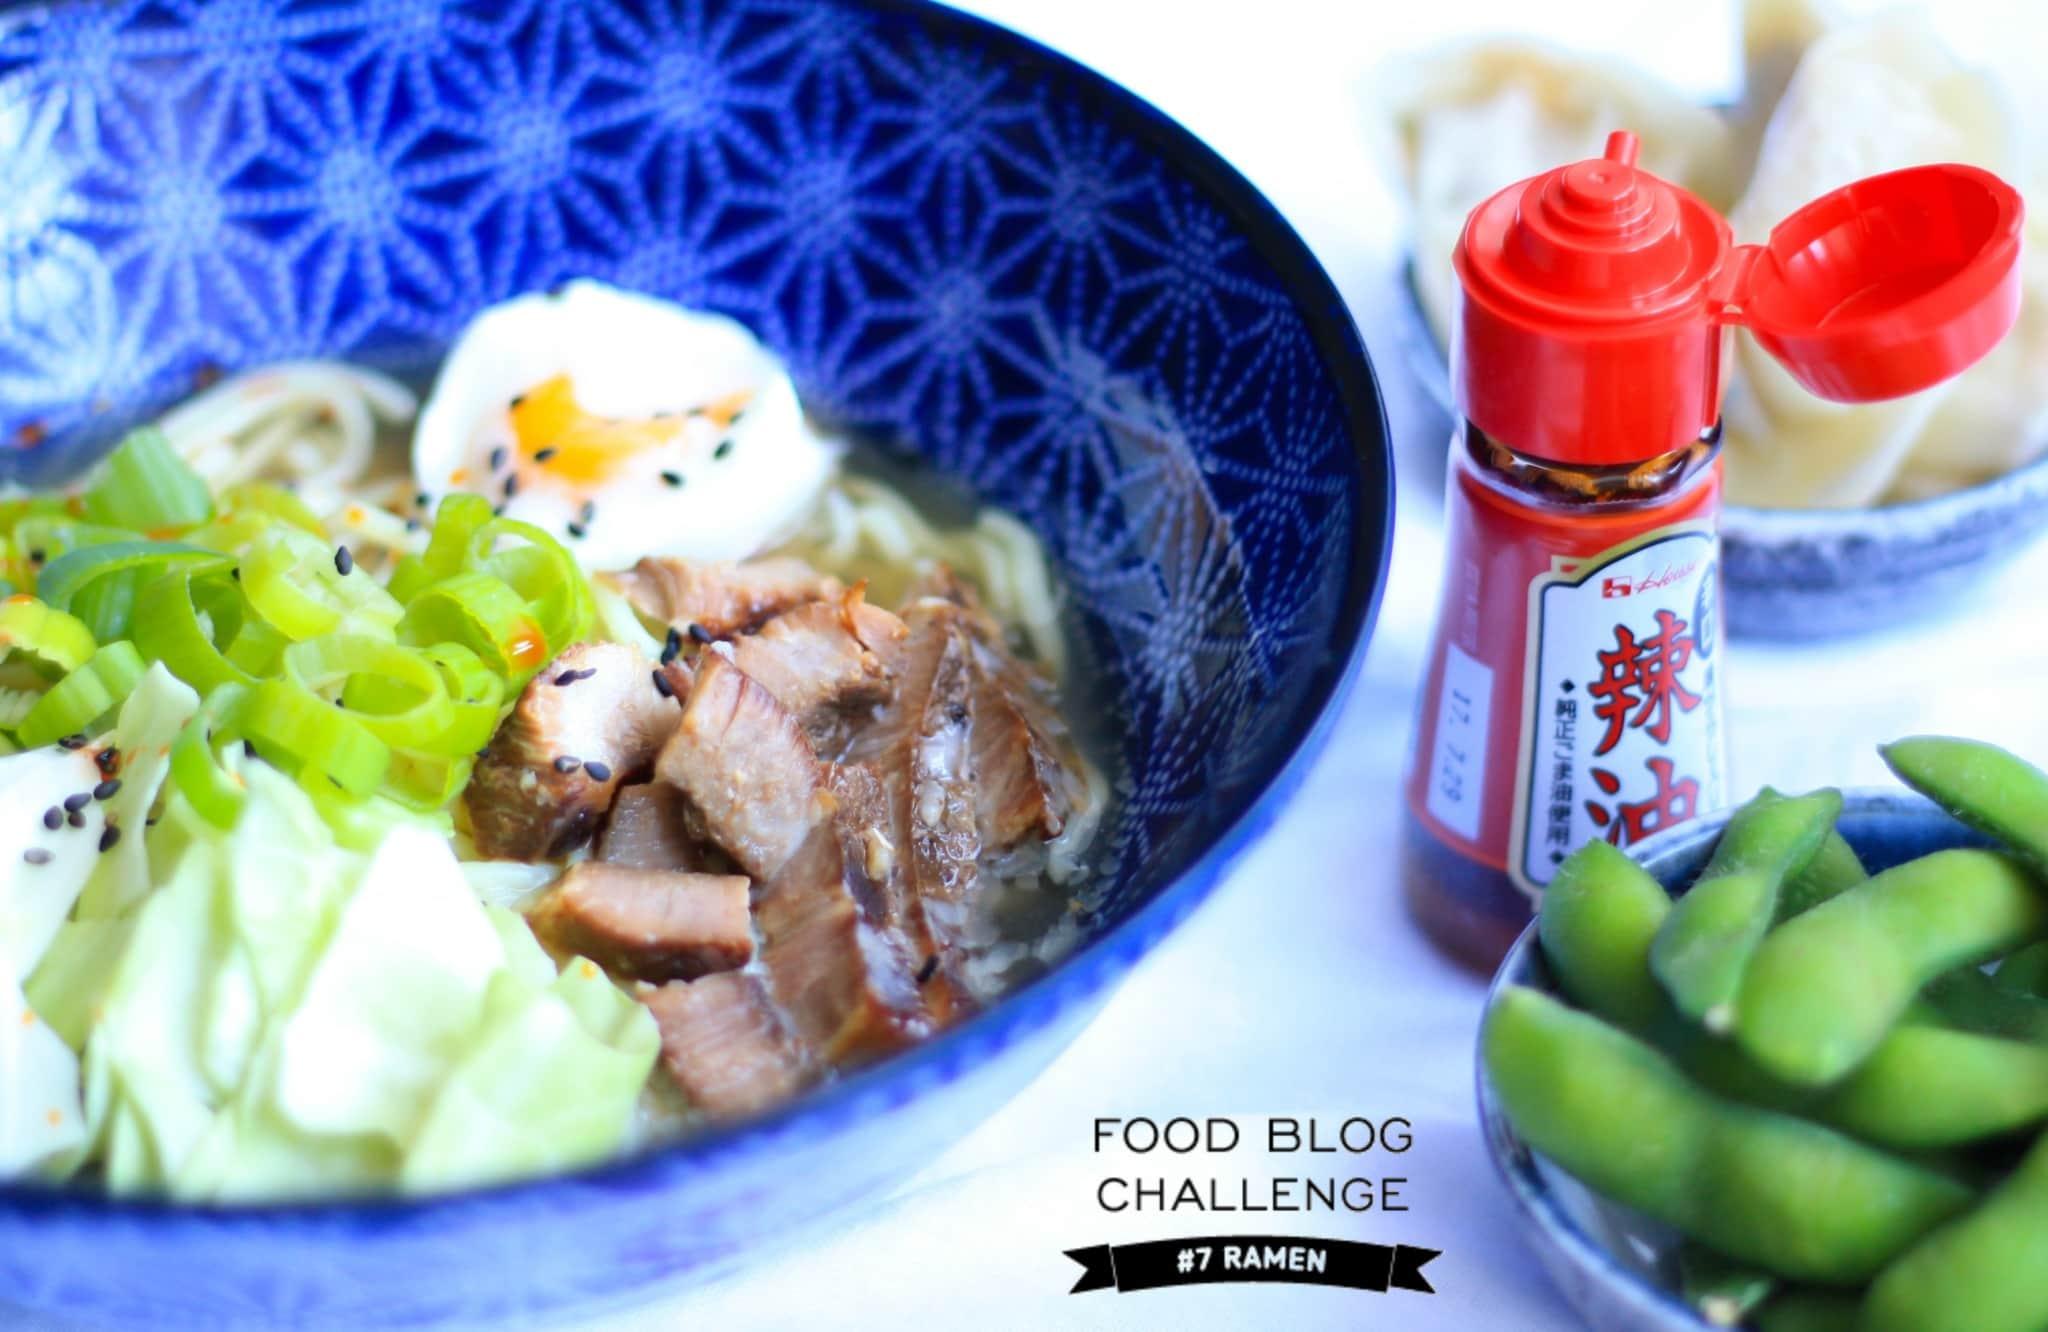 Ramen - Food Blog Challenge #7